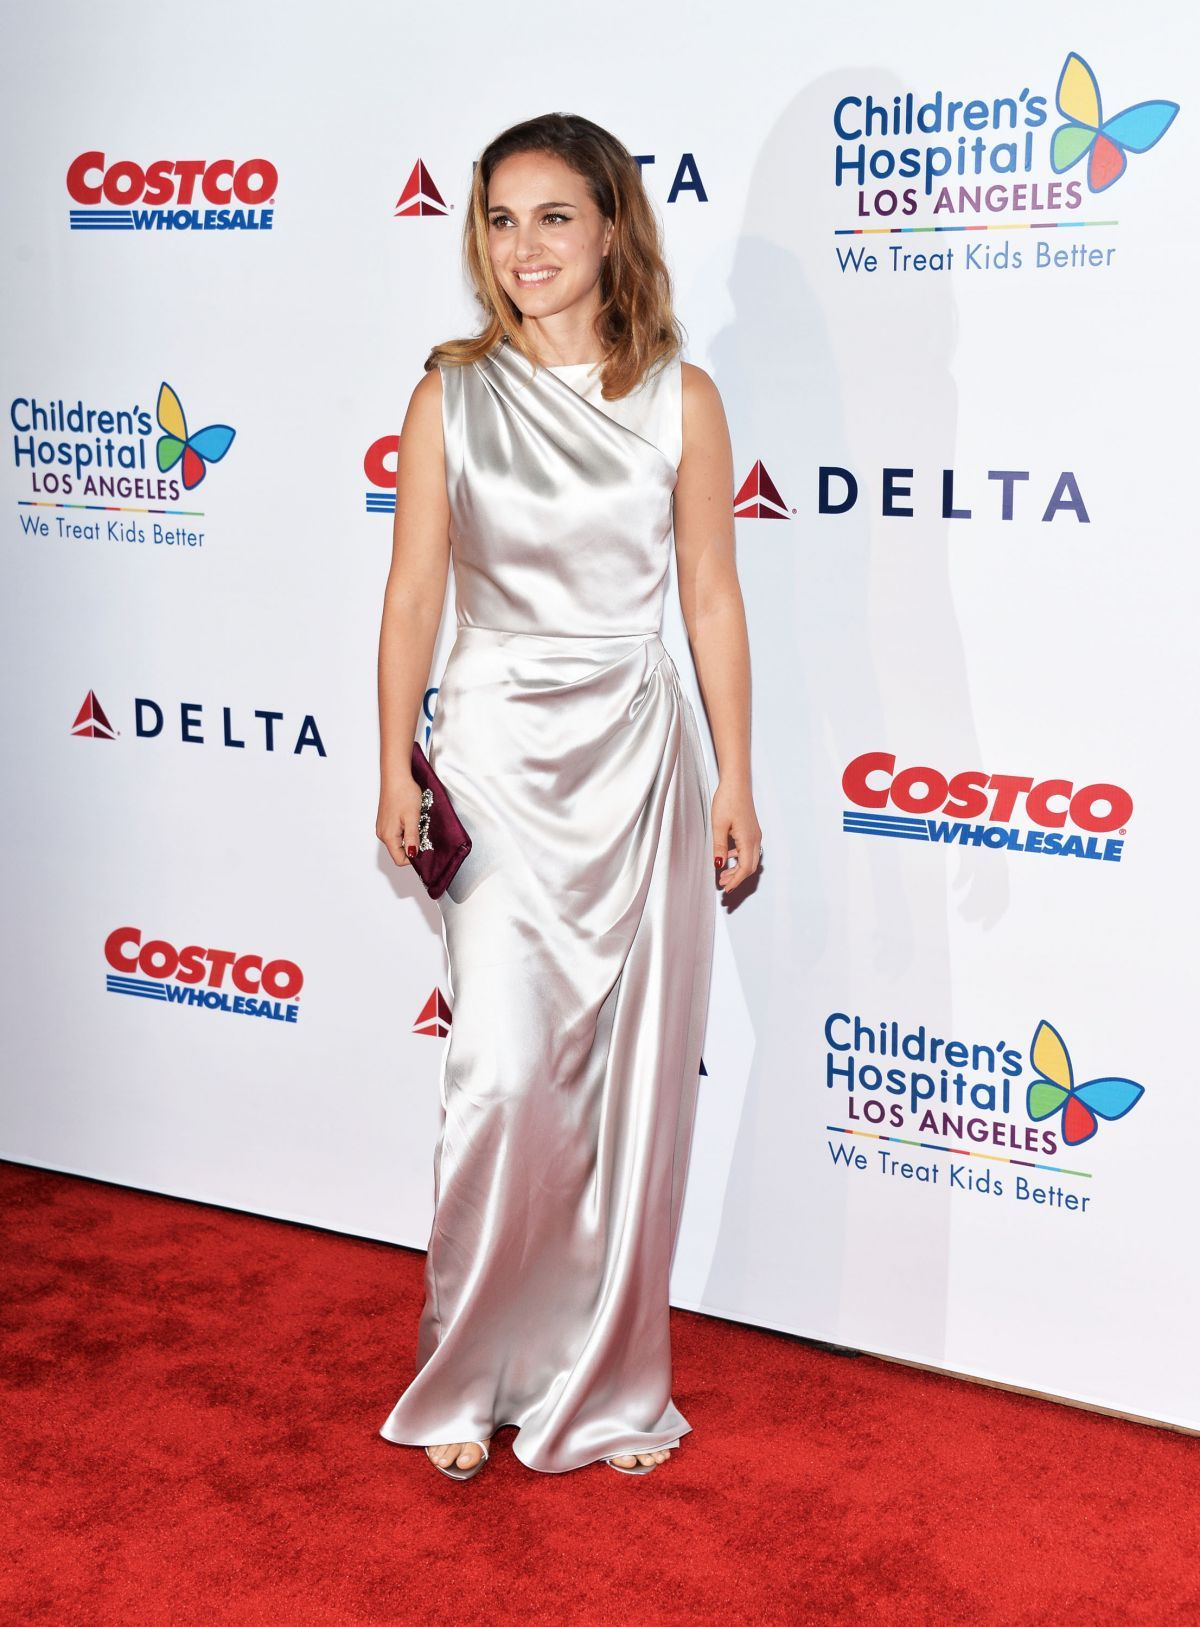 Natalie Portman attends the Children's Hospital Los Angeles' Gala: Noche De Ninos at LA Live on October 11, 2014 in Los Angeles, California.